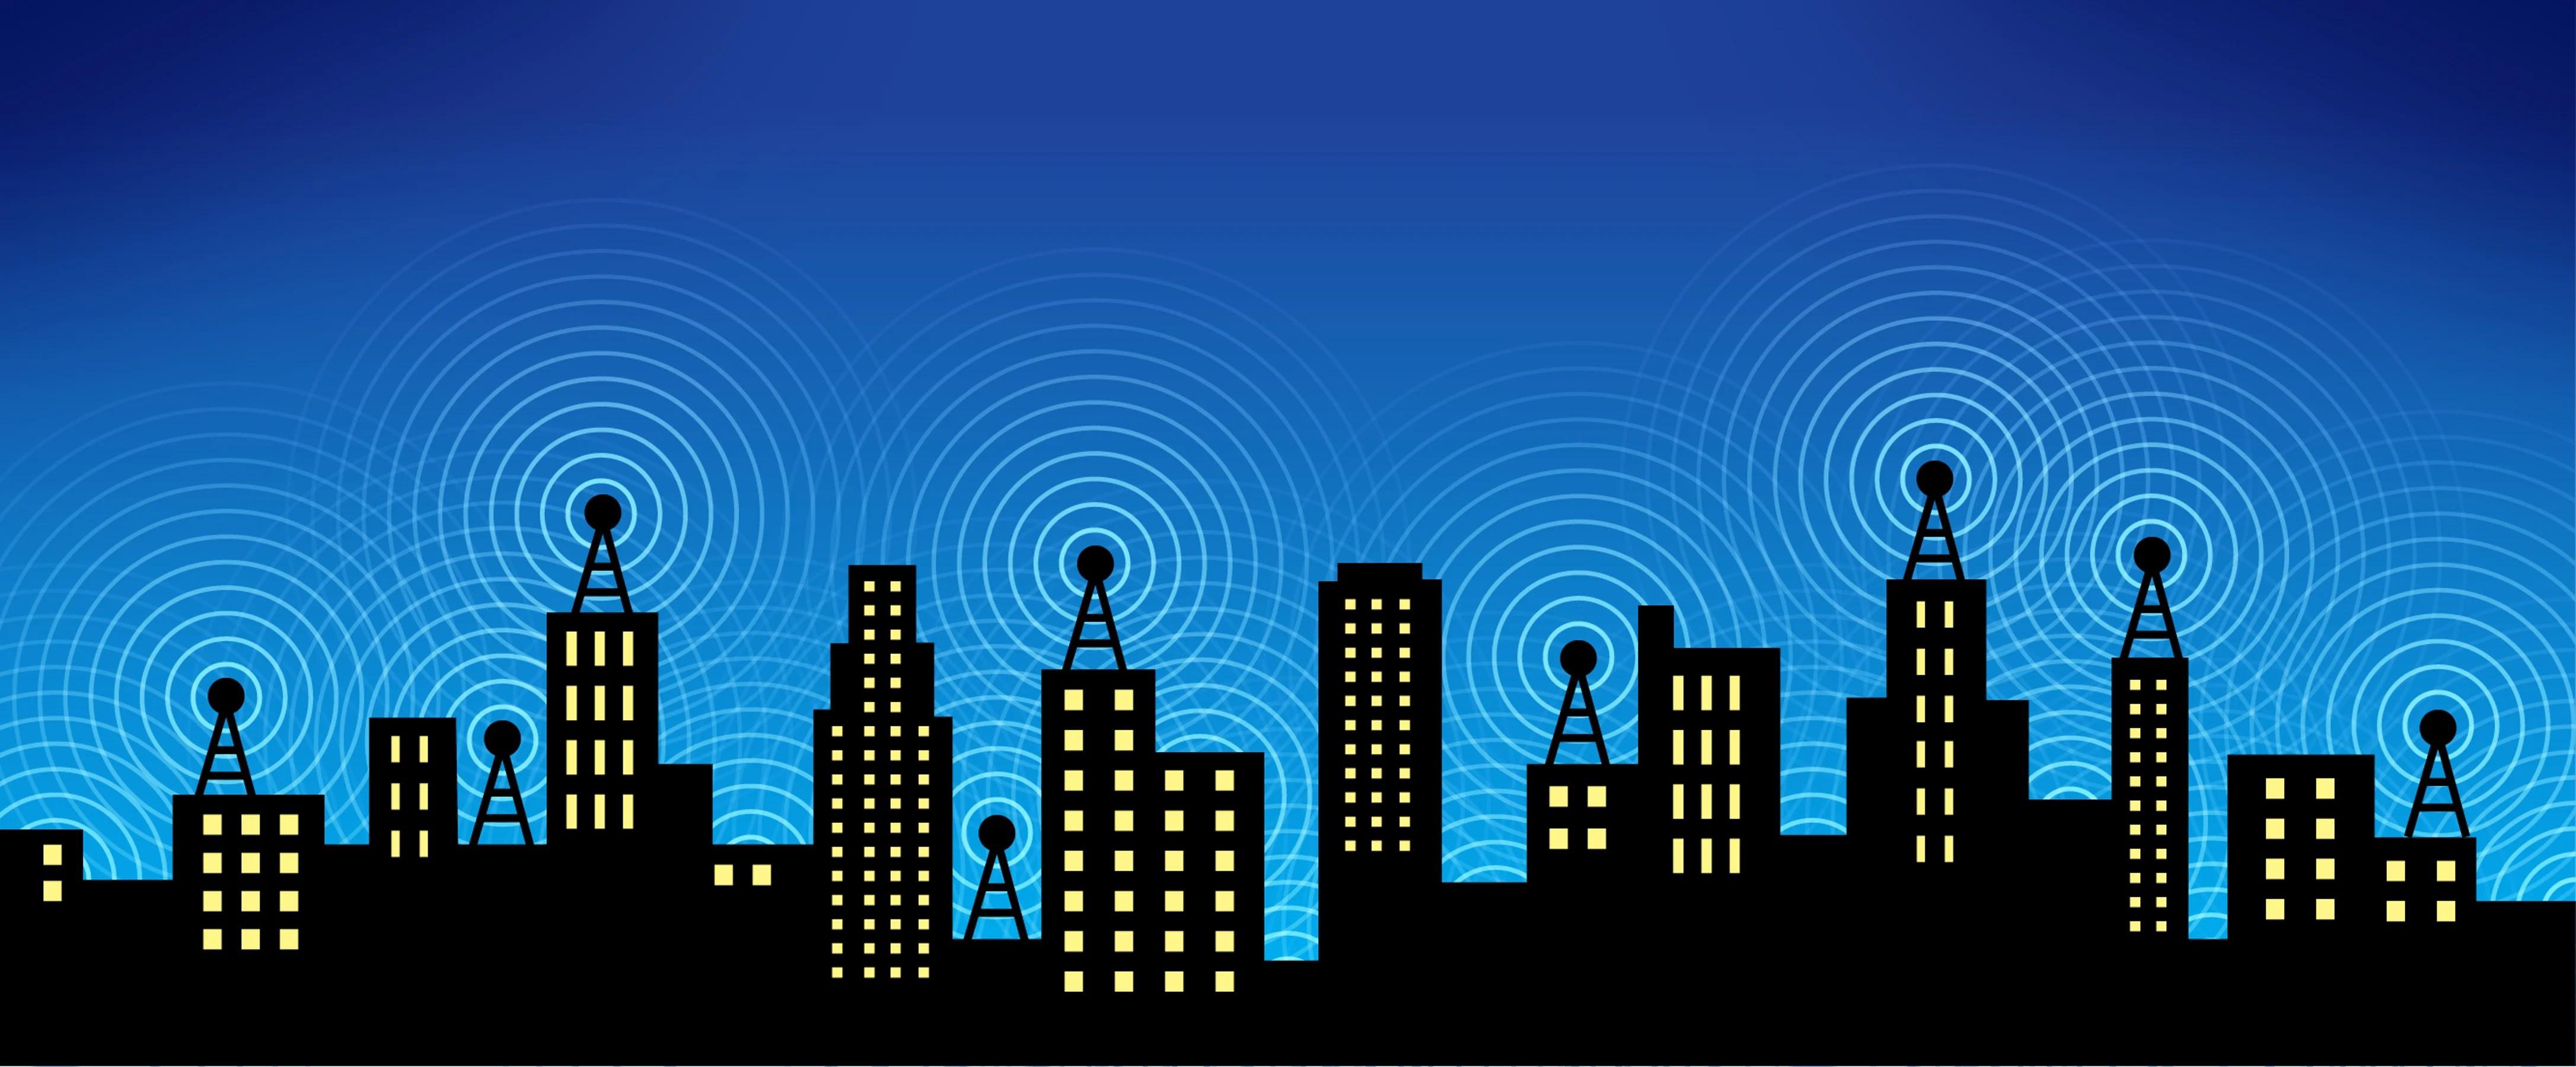 How Are Radio Waves Created